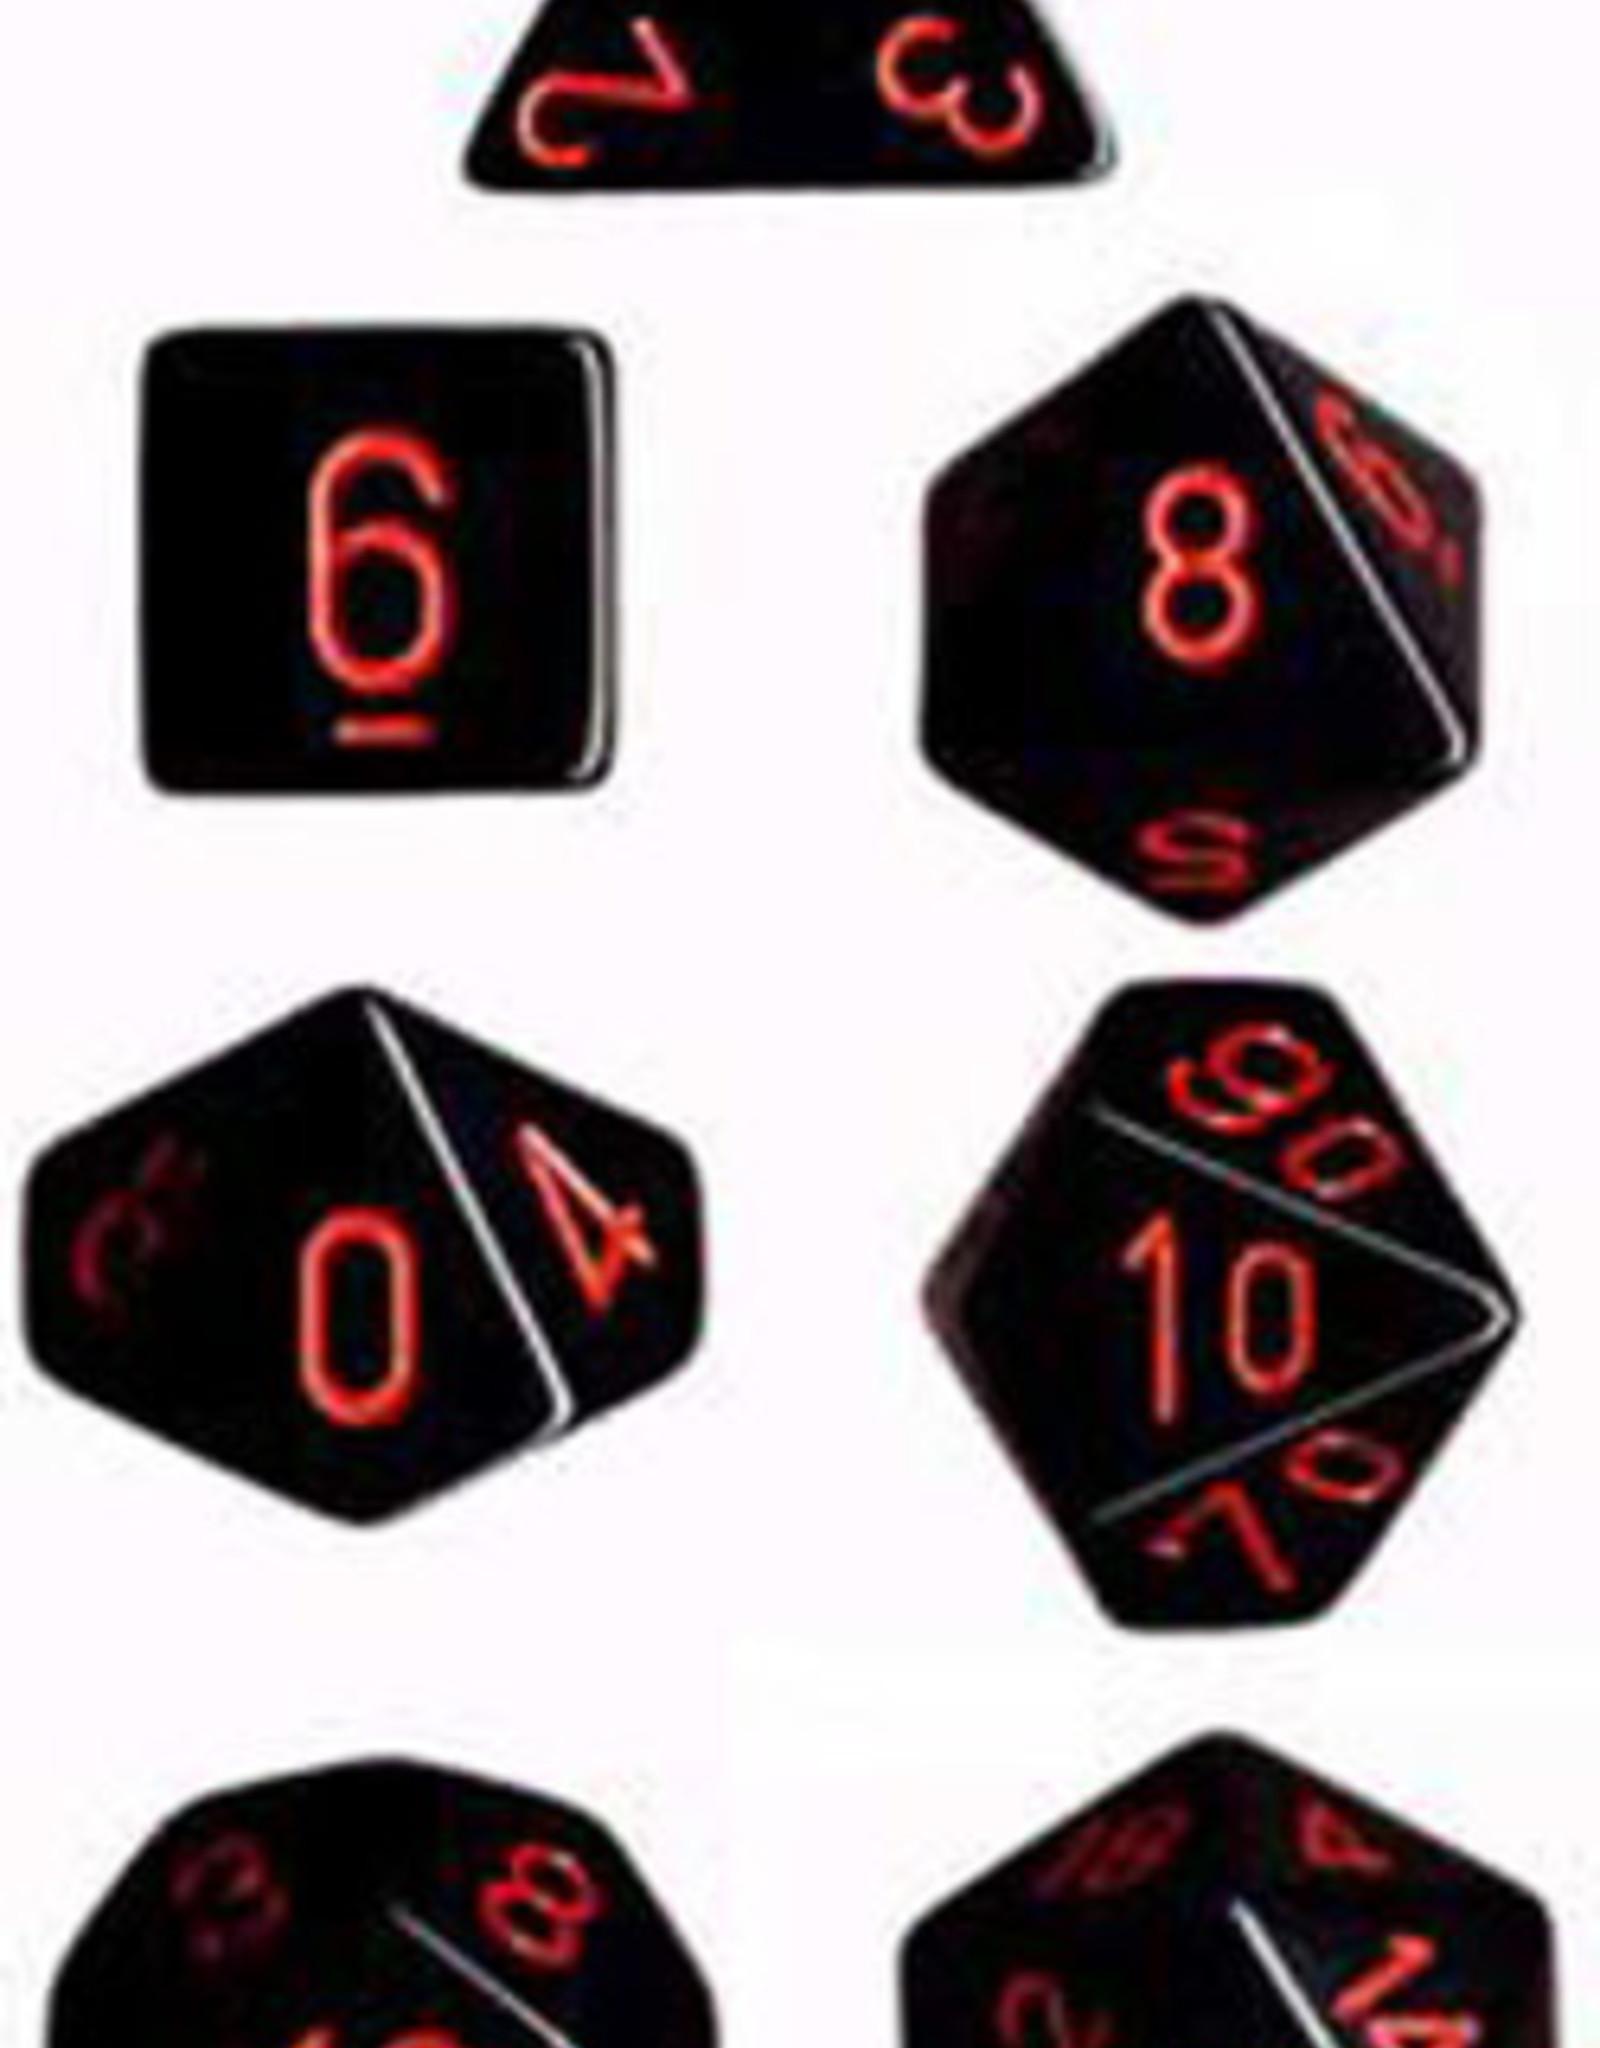 Chessex Dice Block 7ct. - Black/Red